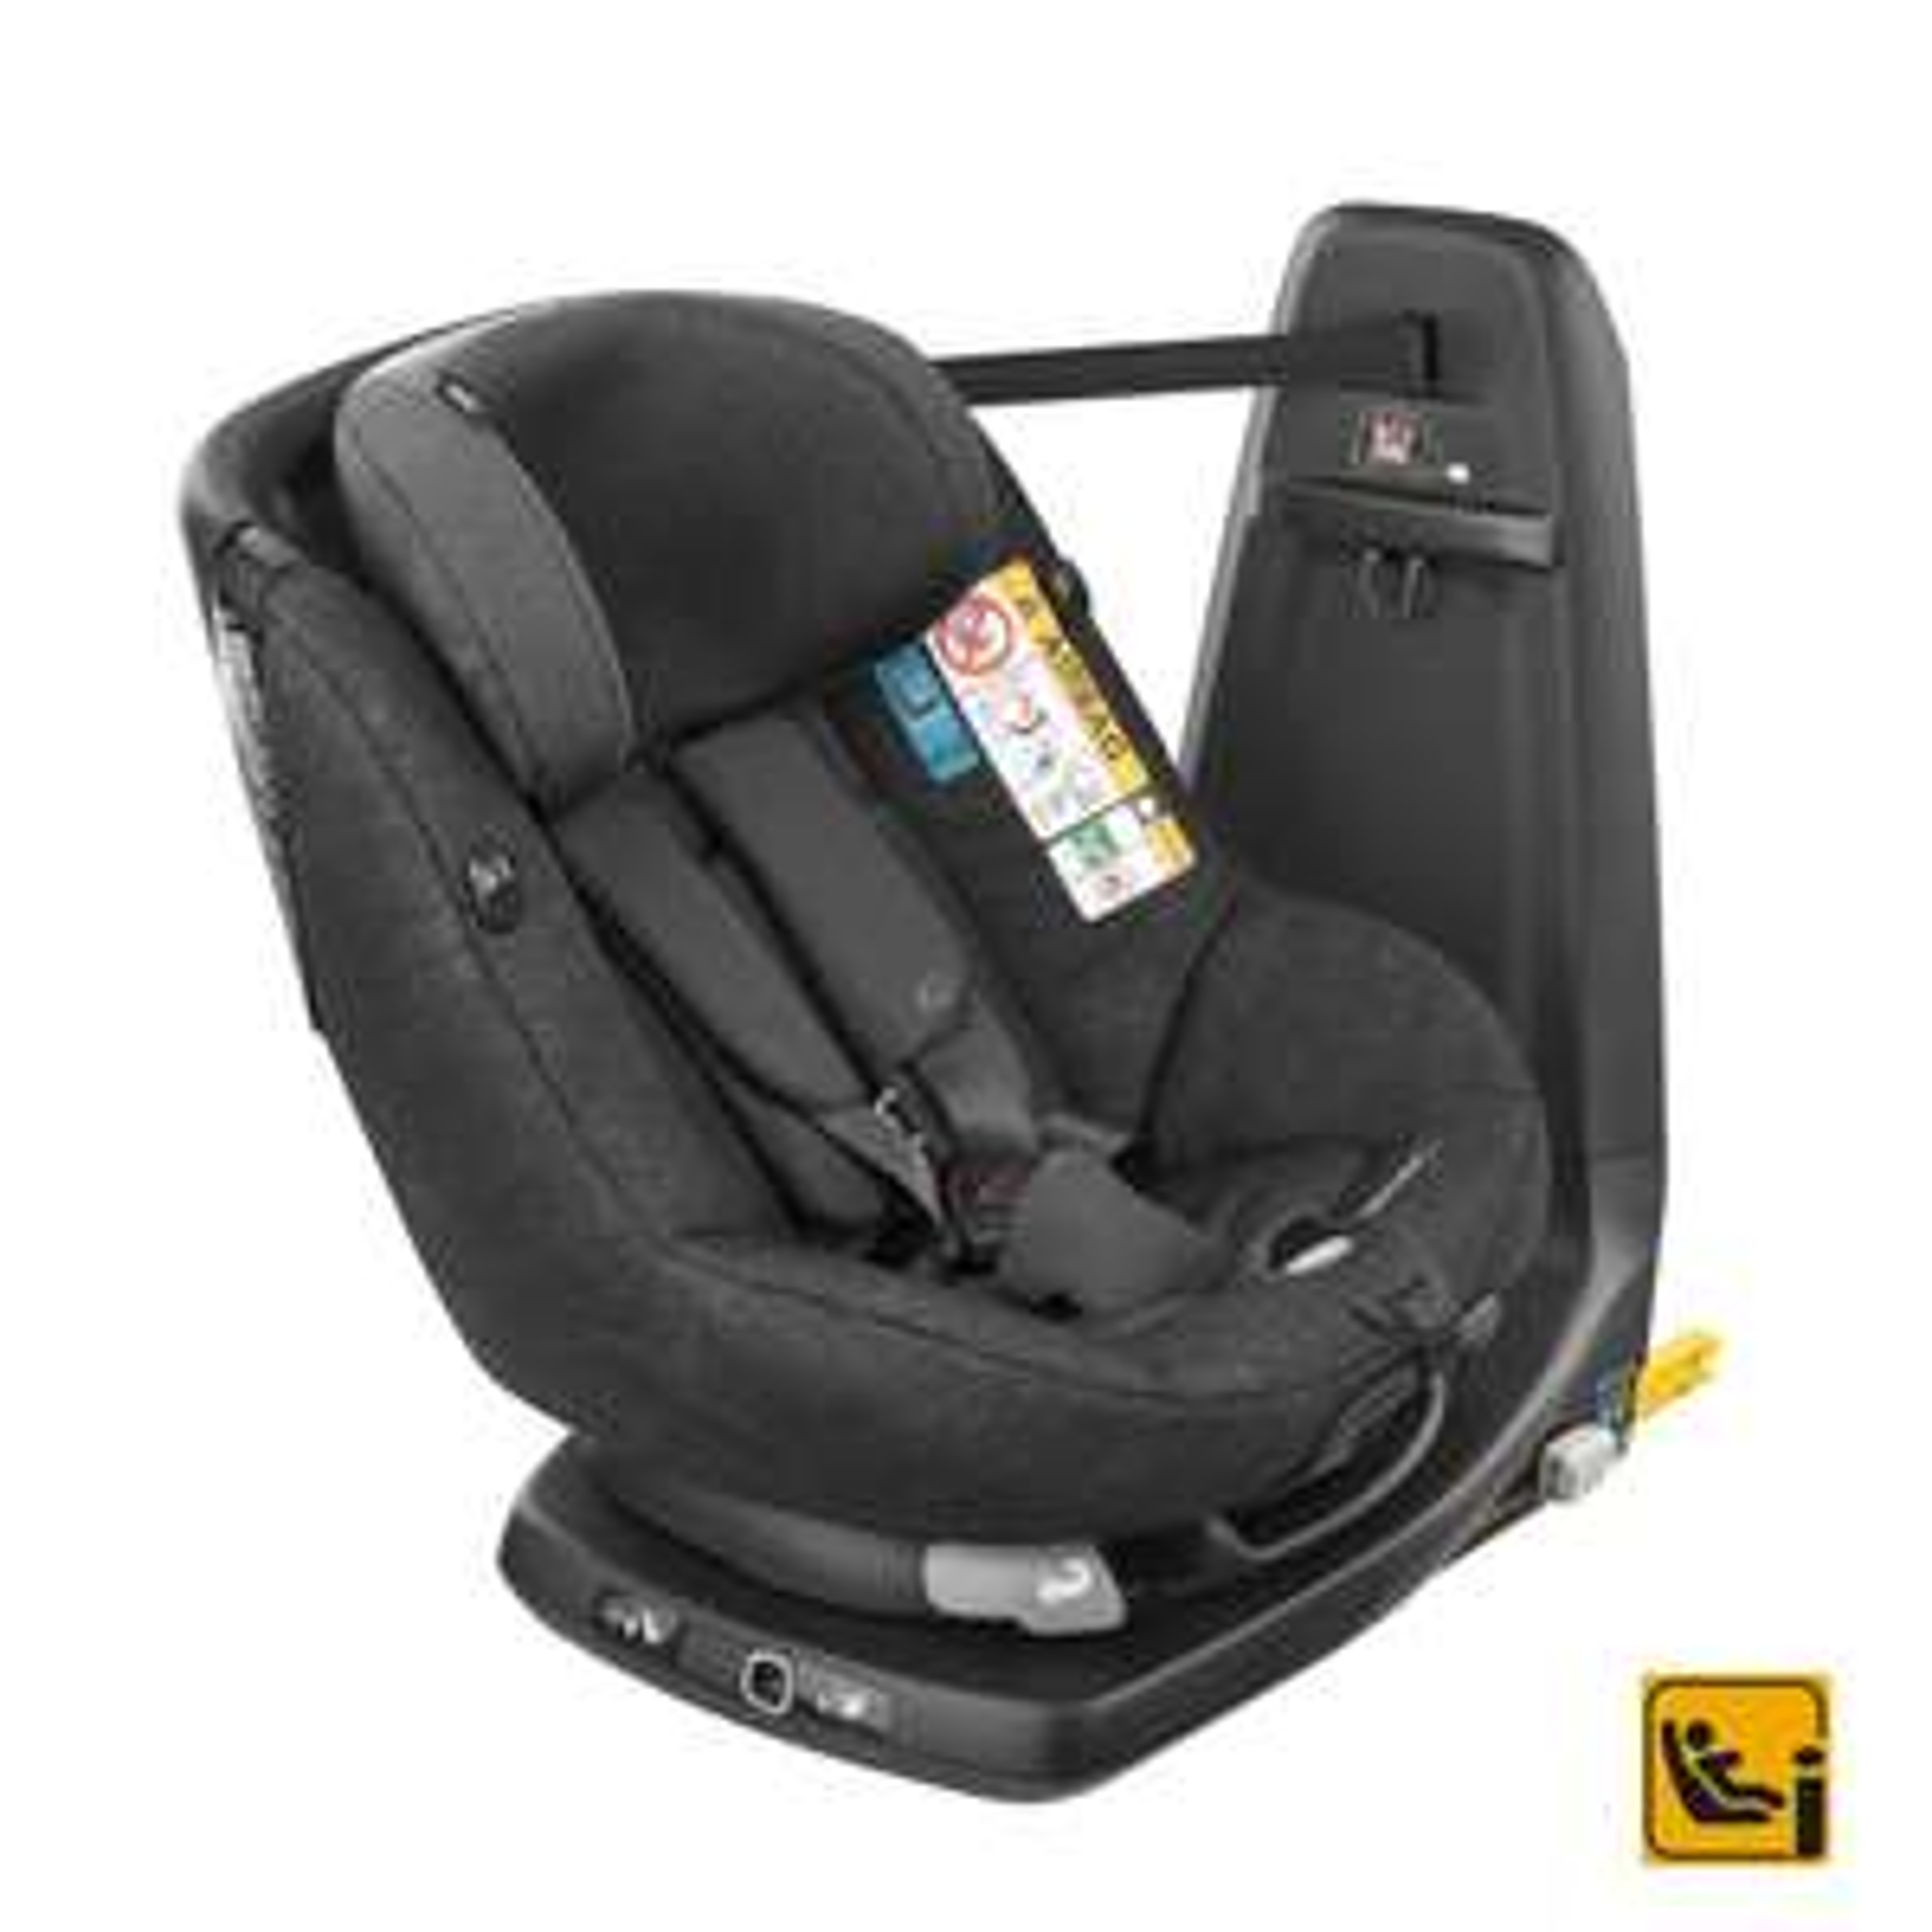 Siège auto bébé AxssixFix Nomad Bébé Confort - i-Size (R129), Jusqu'à 105cm